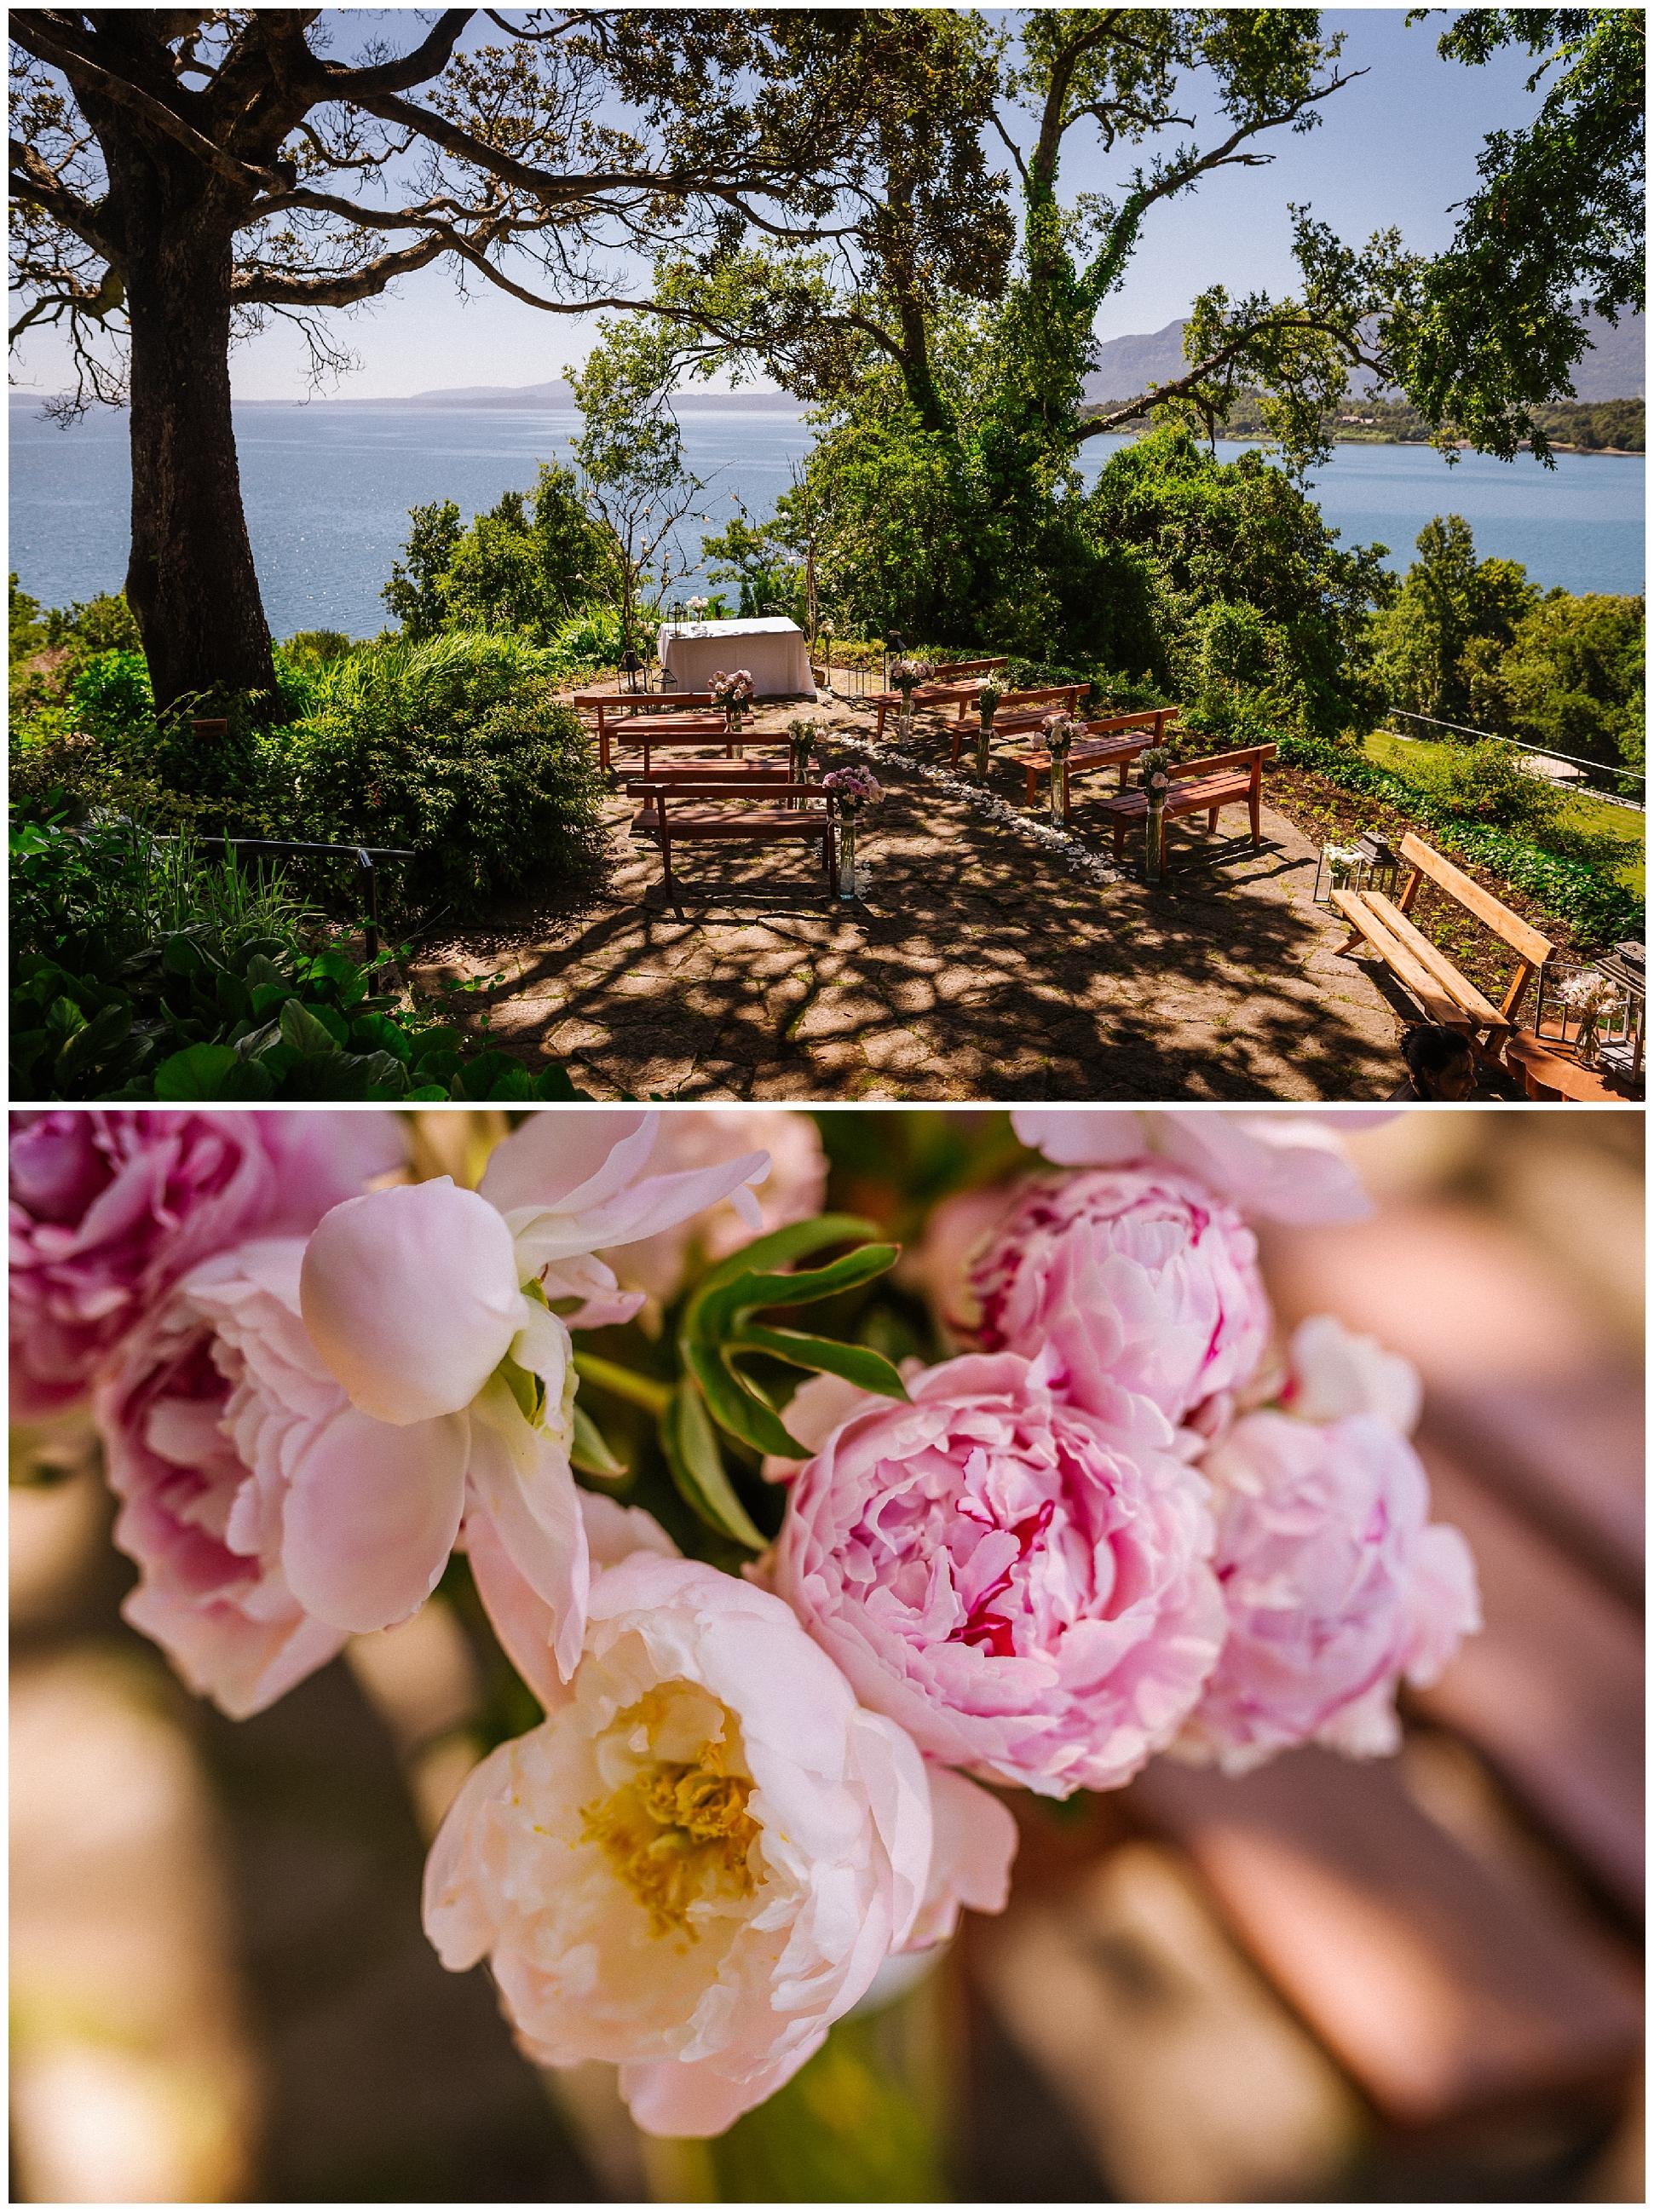 Cheilean-destination-adventure-wedding-florida-patagonia-pucon-santa-cruz-vsco_0064.jpg